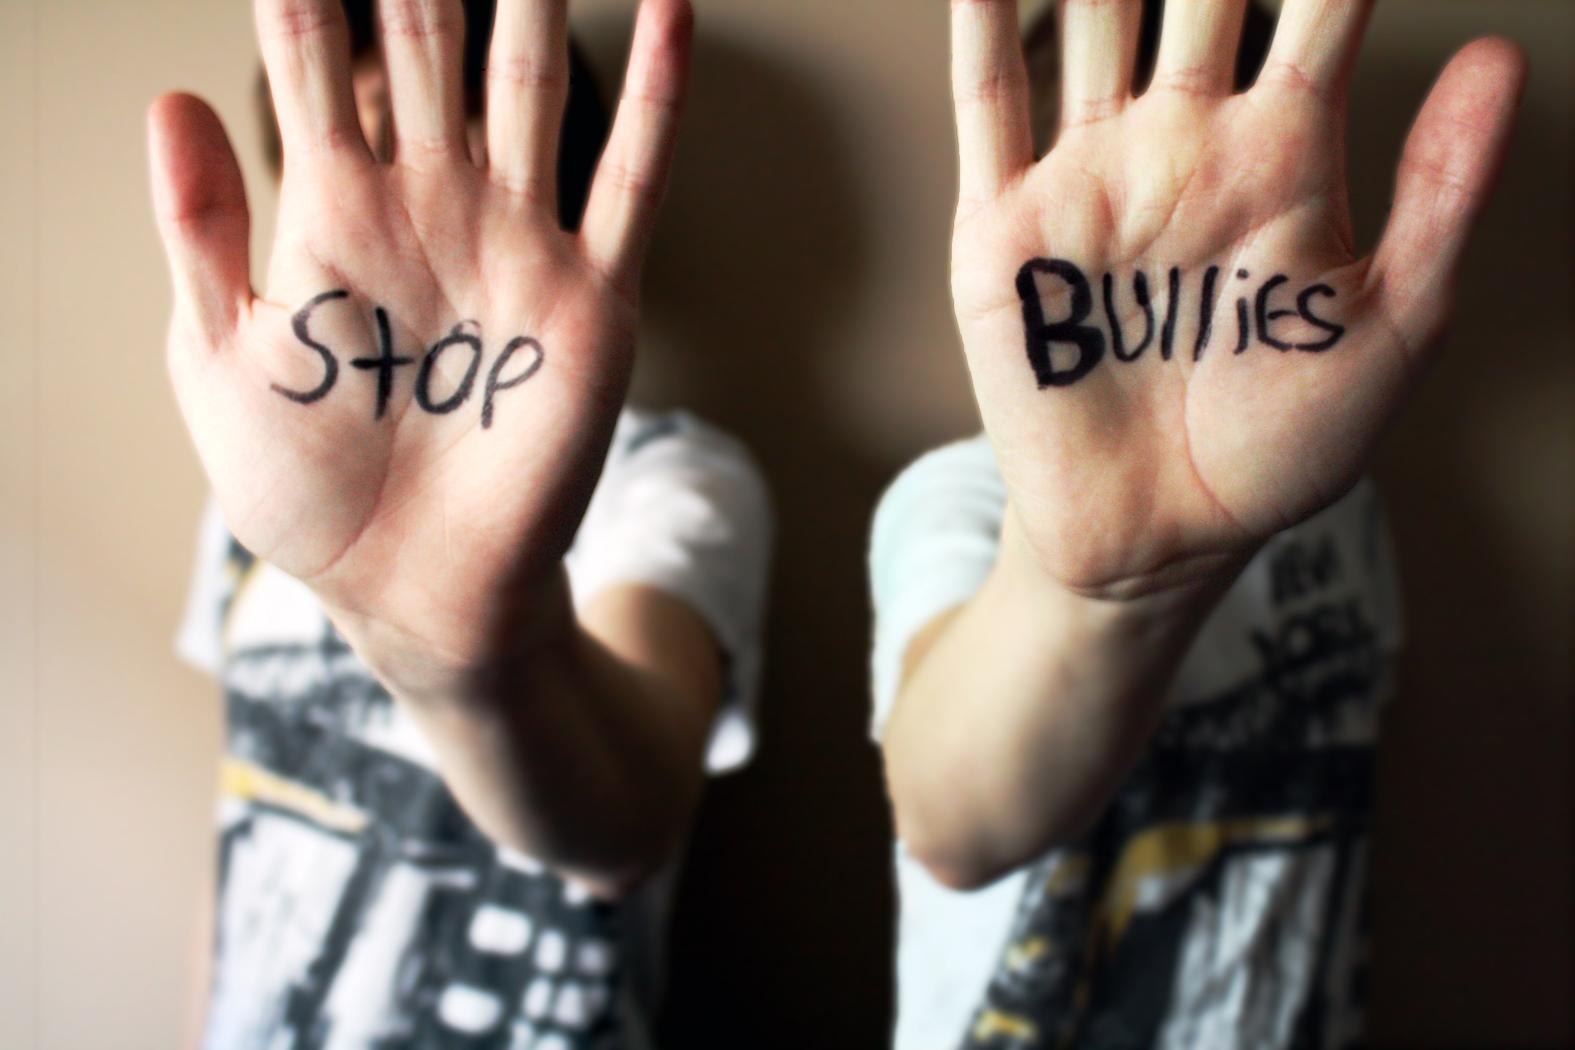 YouWillRise stopbullies